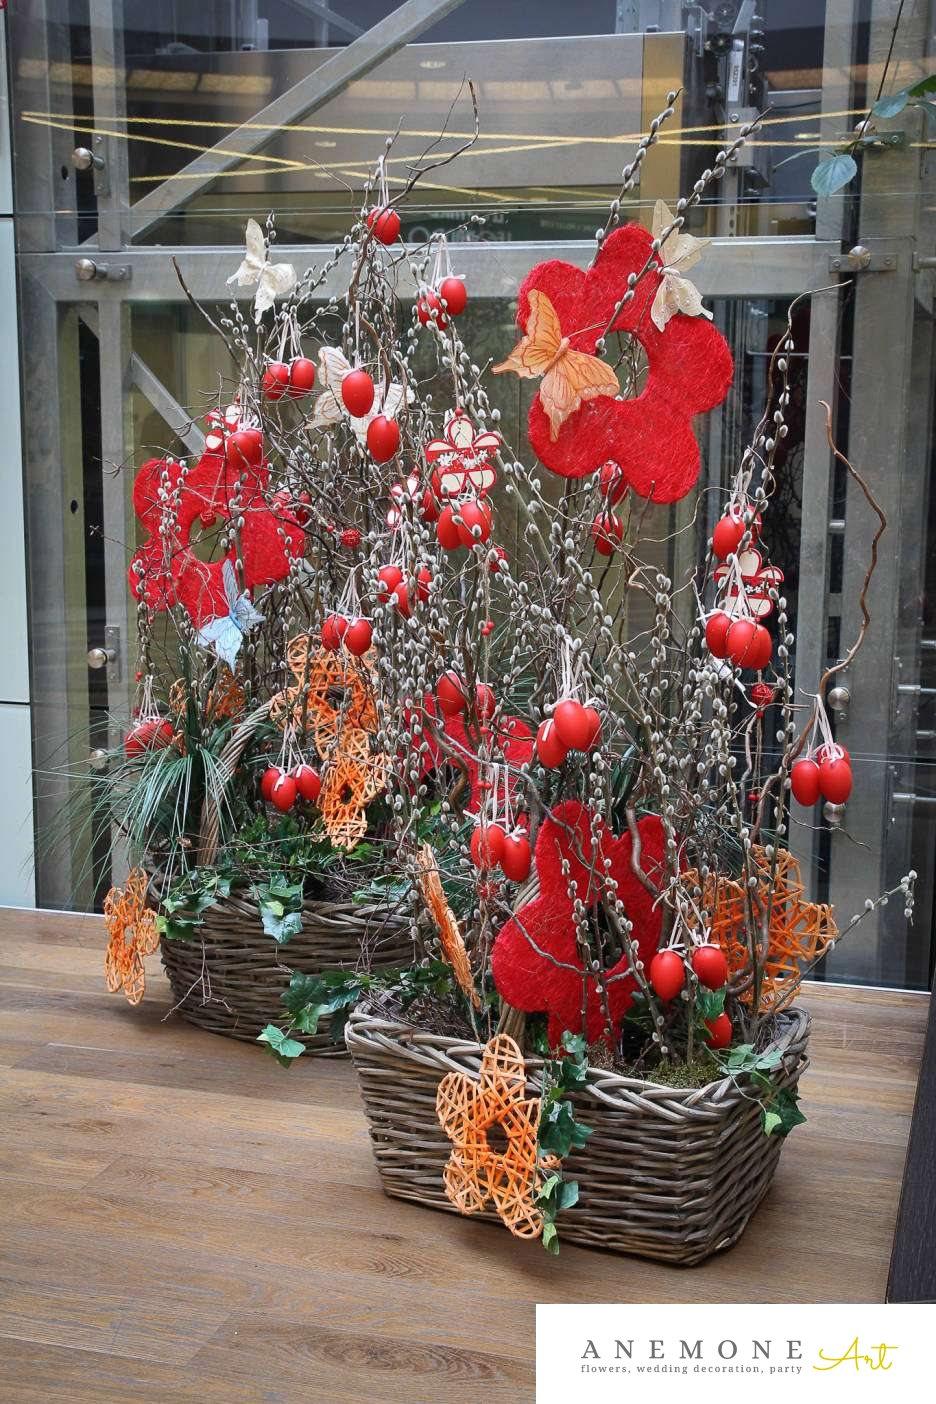 Poza, foto cu Flori de nunta cos decor, decor tematic, matisor, portocaliu, rosu in Arad, Timisoara, Oradea (wedding flowers, bouquets) nunta Arad, Timisoara, Oradea